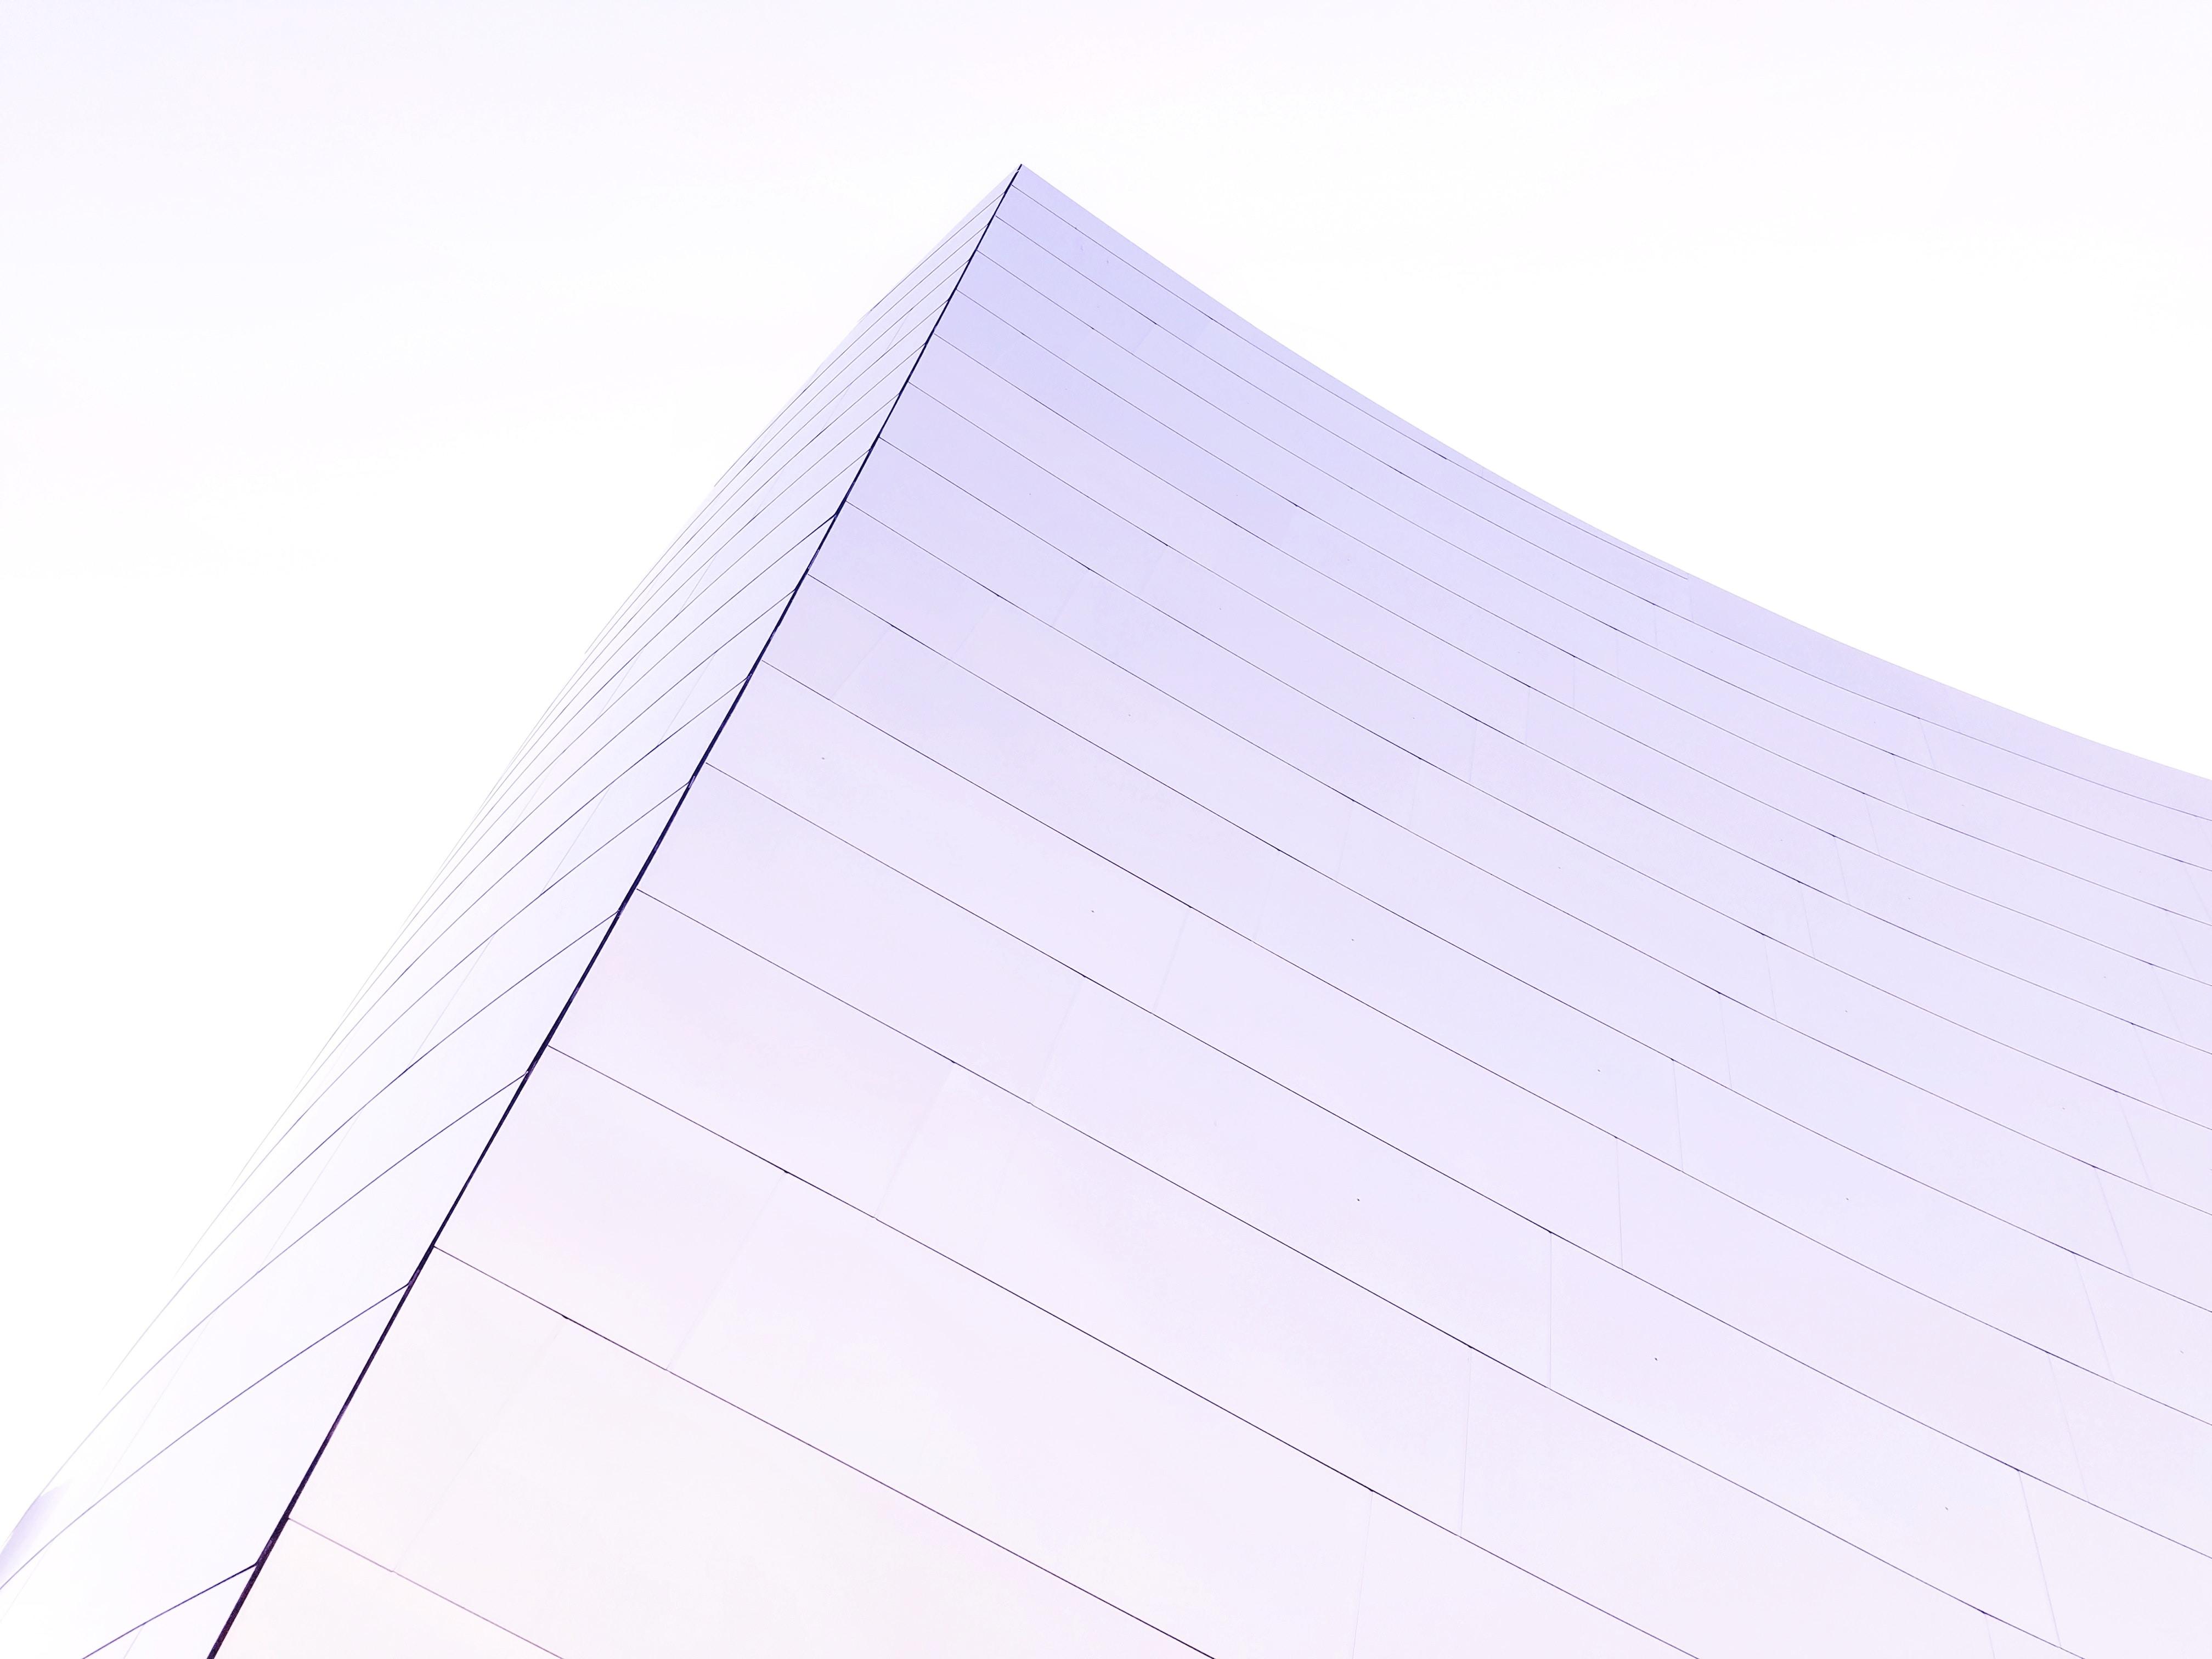 high-raise building